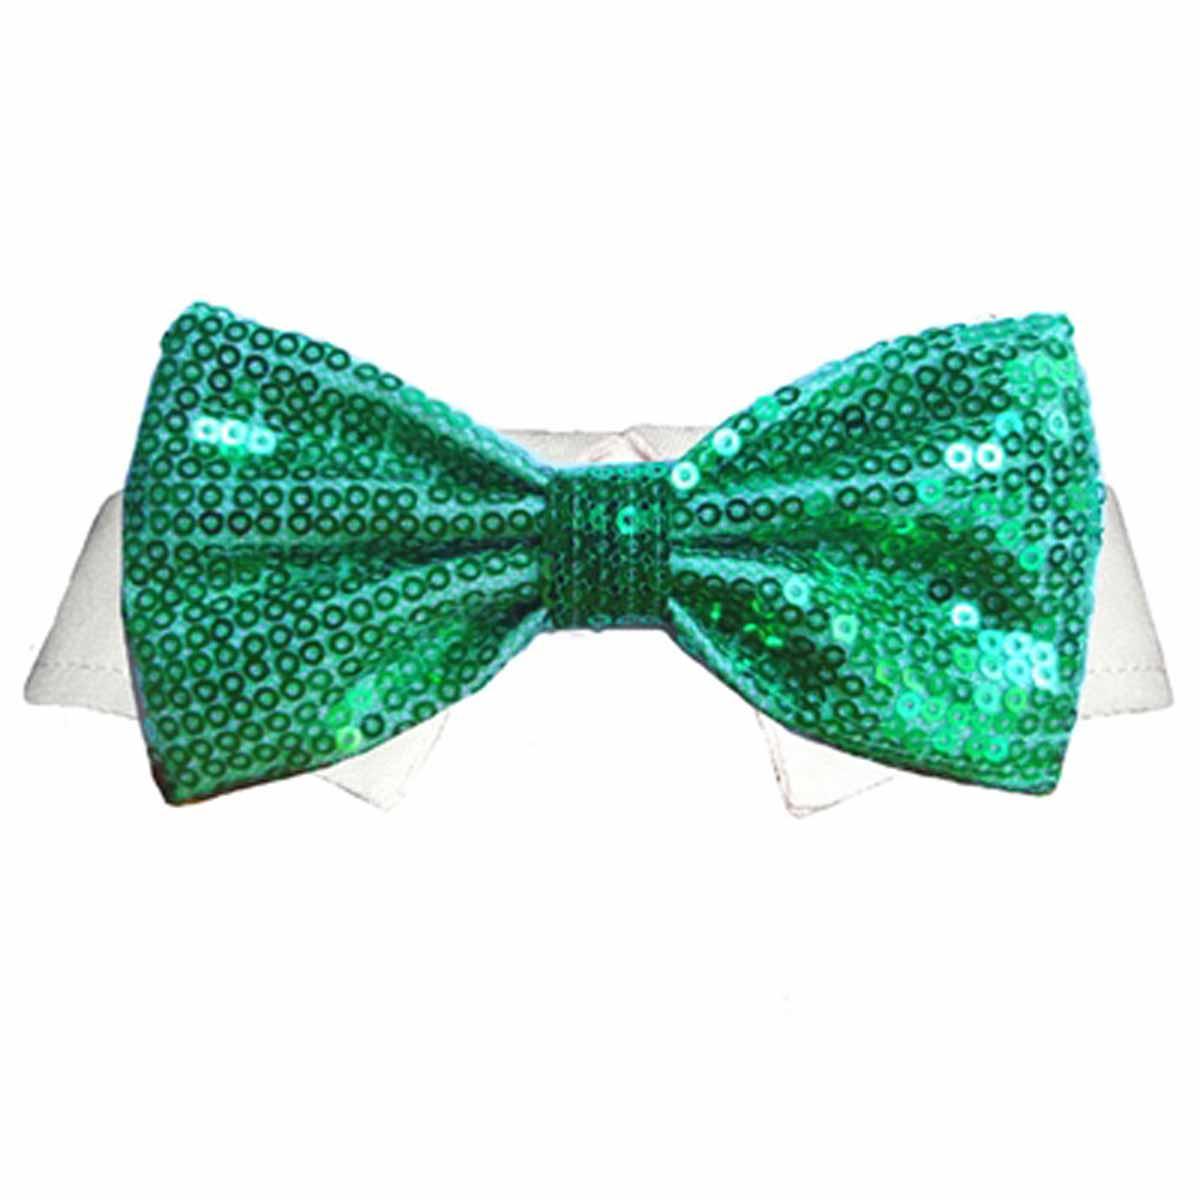 Dublin Dog Shirt Collar And Bow Tie Green Baxterboo